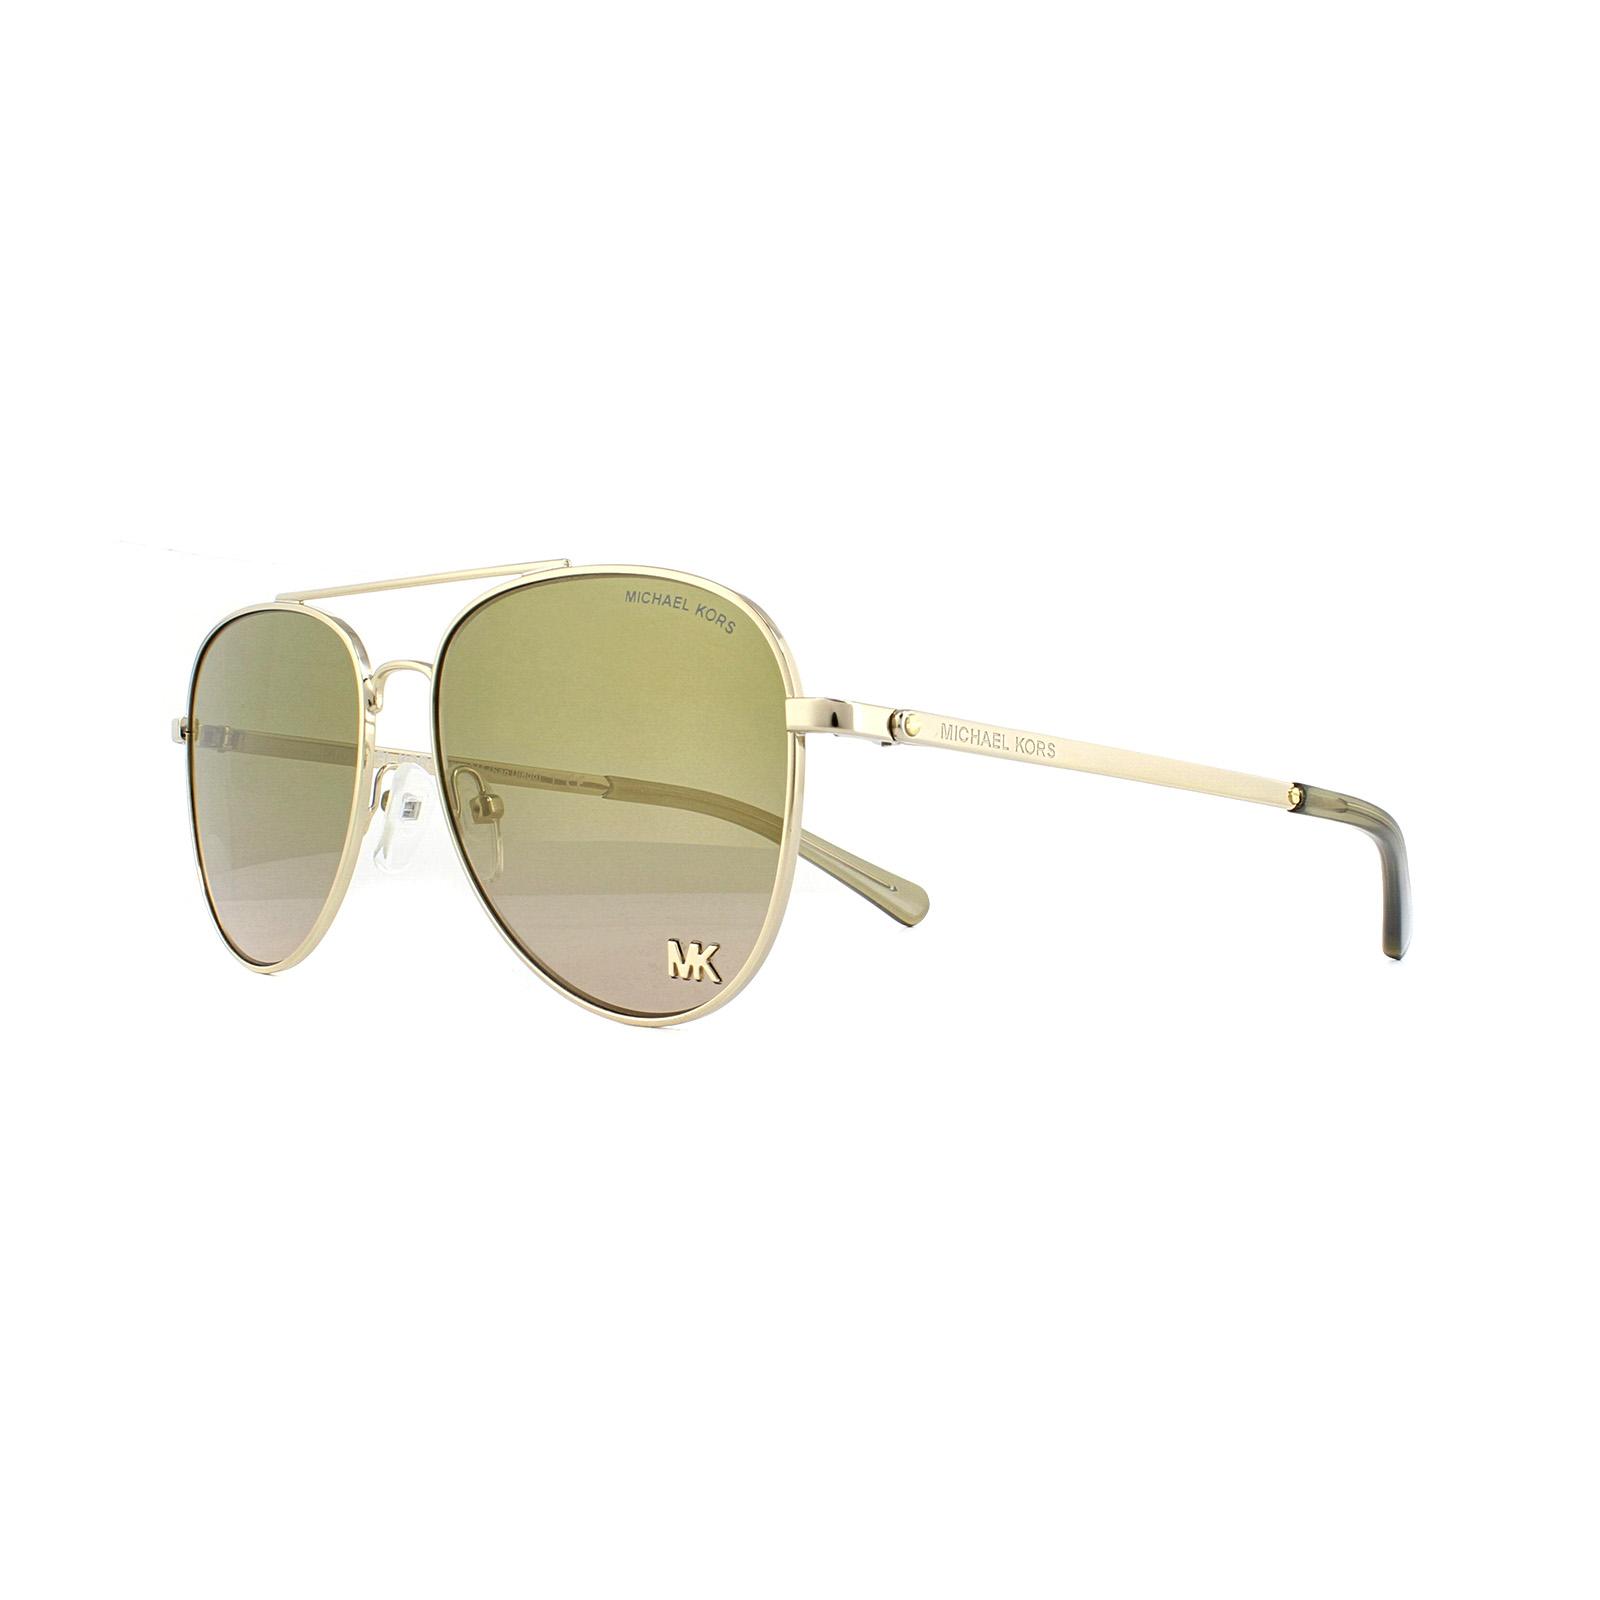 Michael Kors San Diego Sonnenbrille Rose Gold Damen